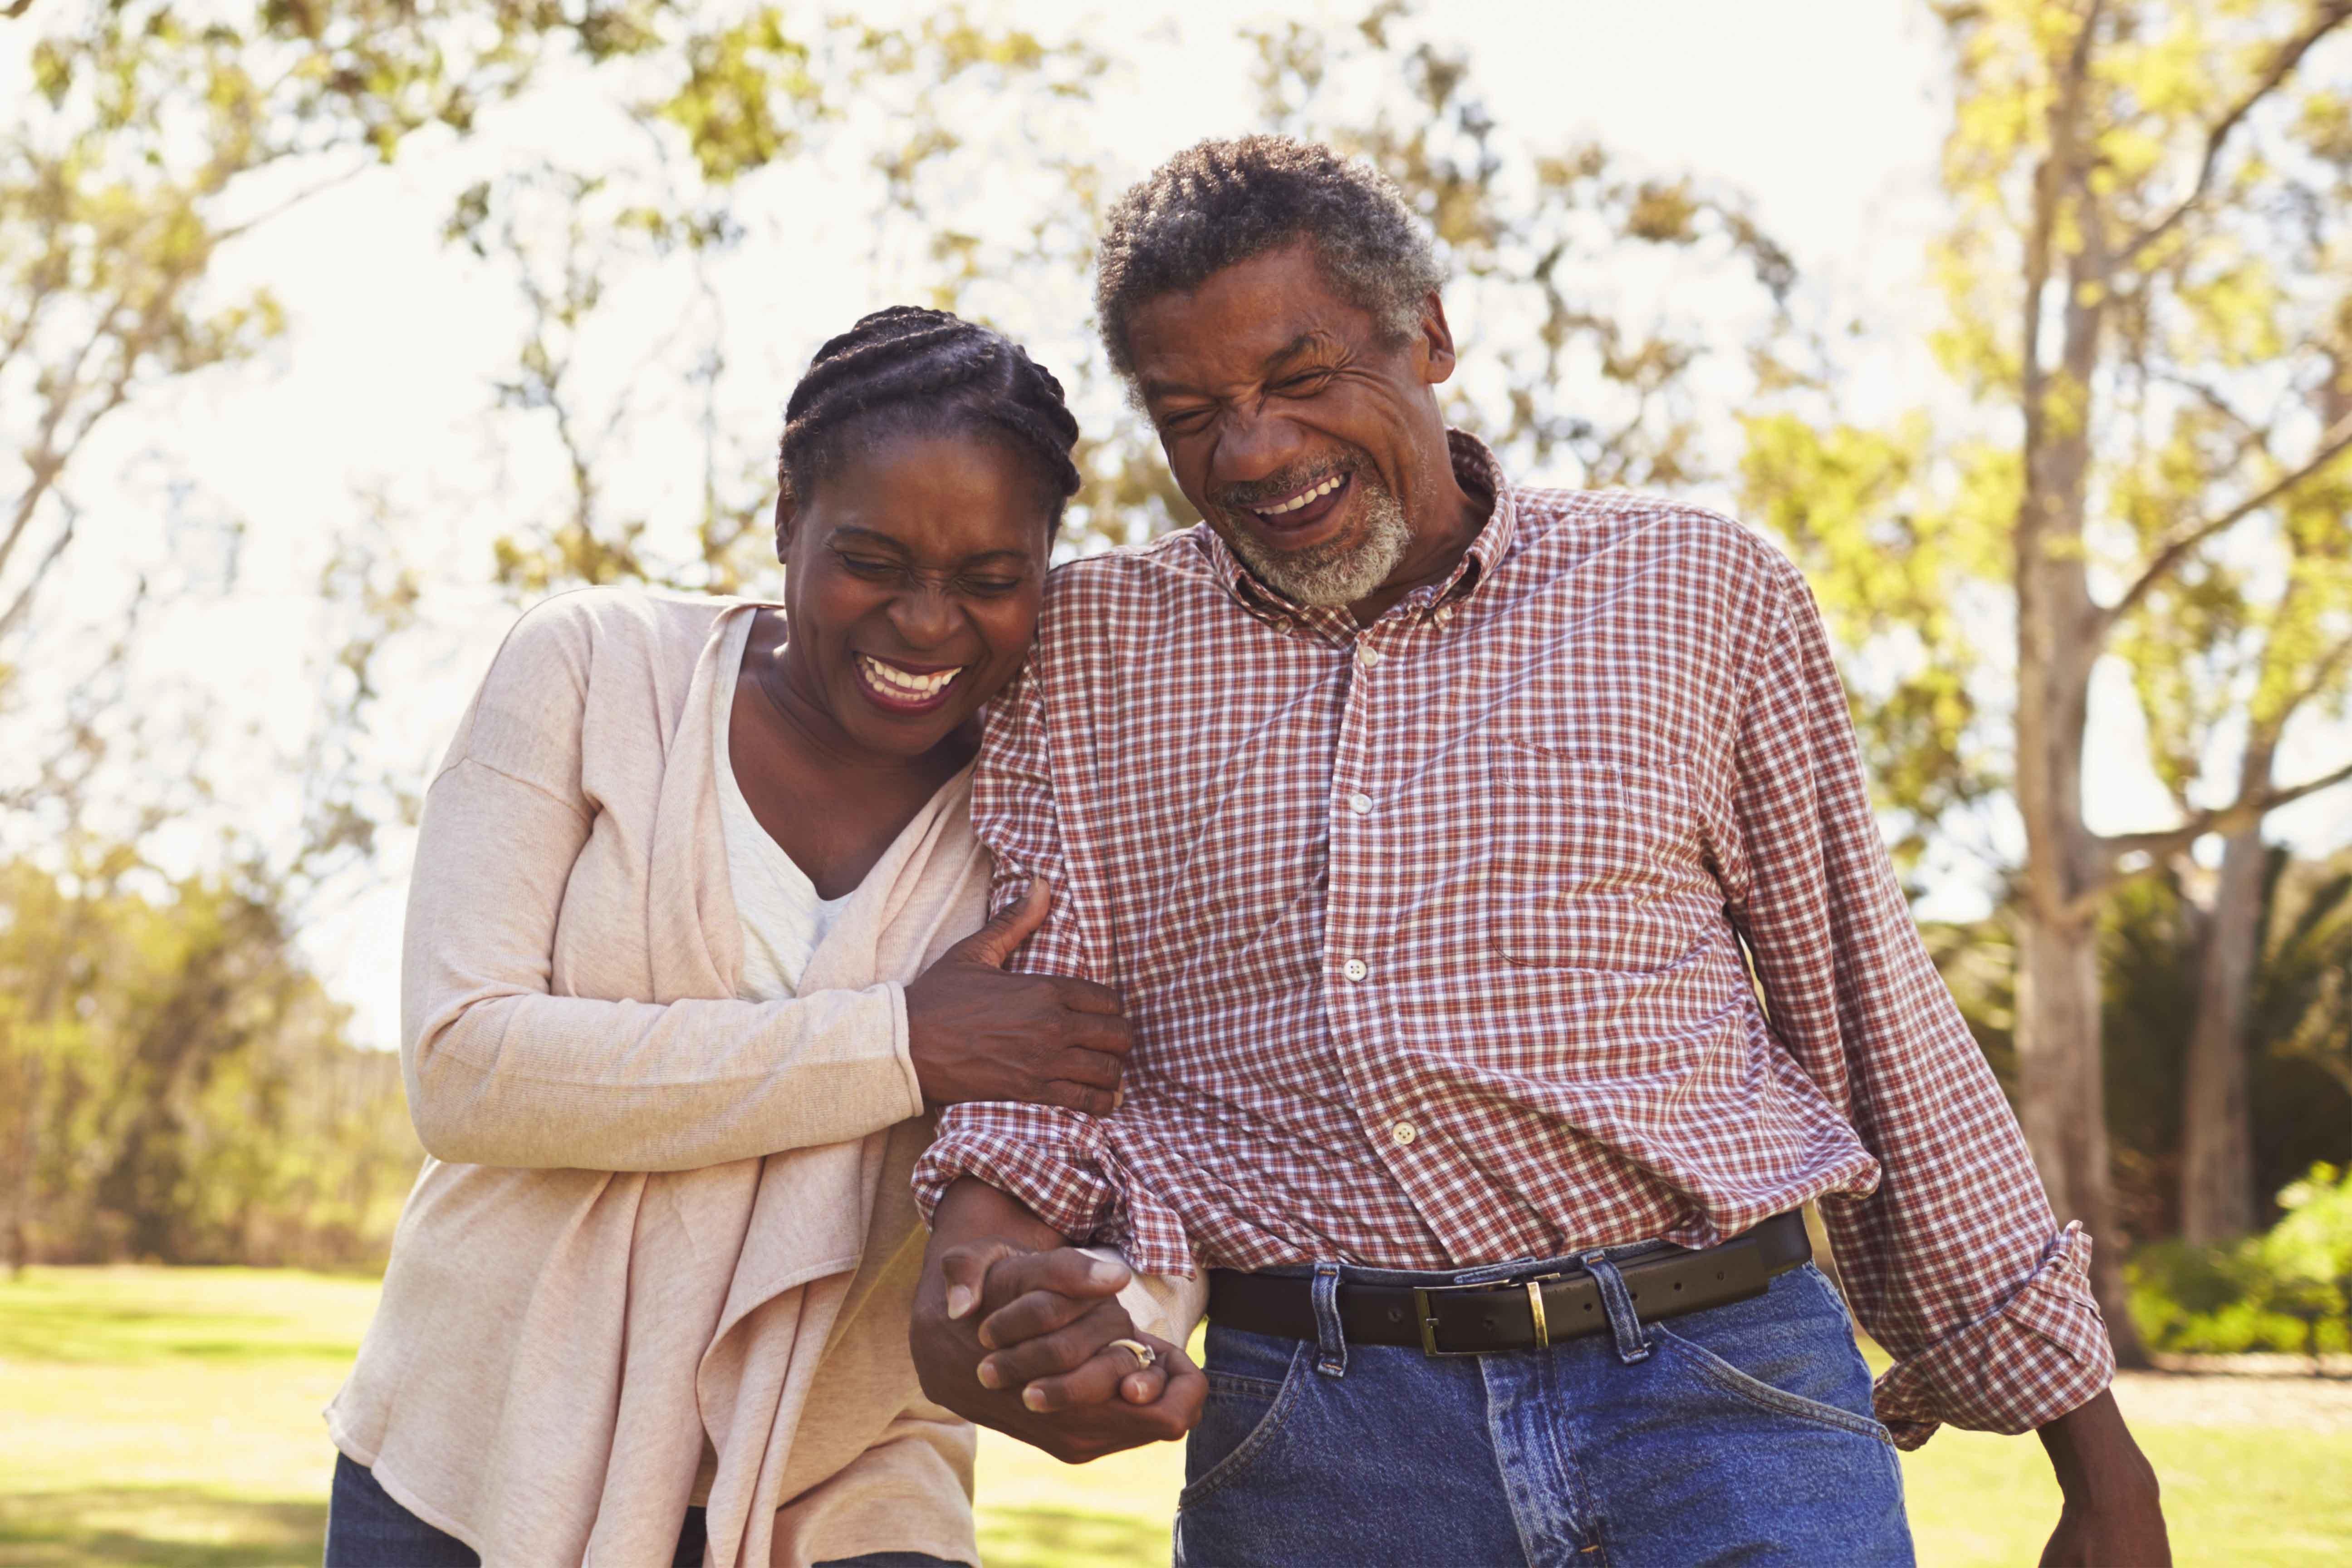 Medi-Share Senior Assist Couple On A Walk